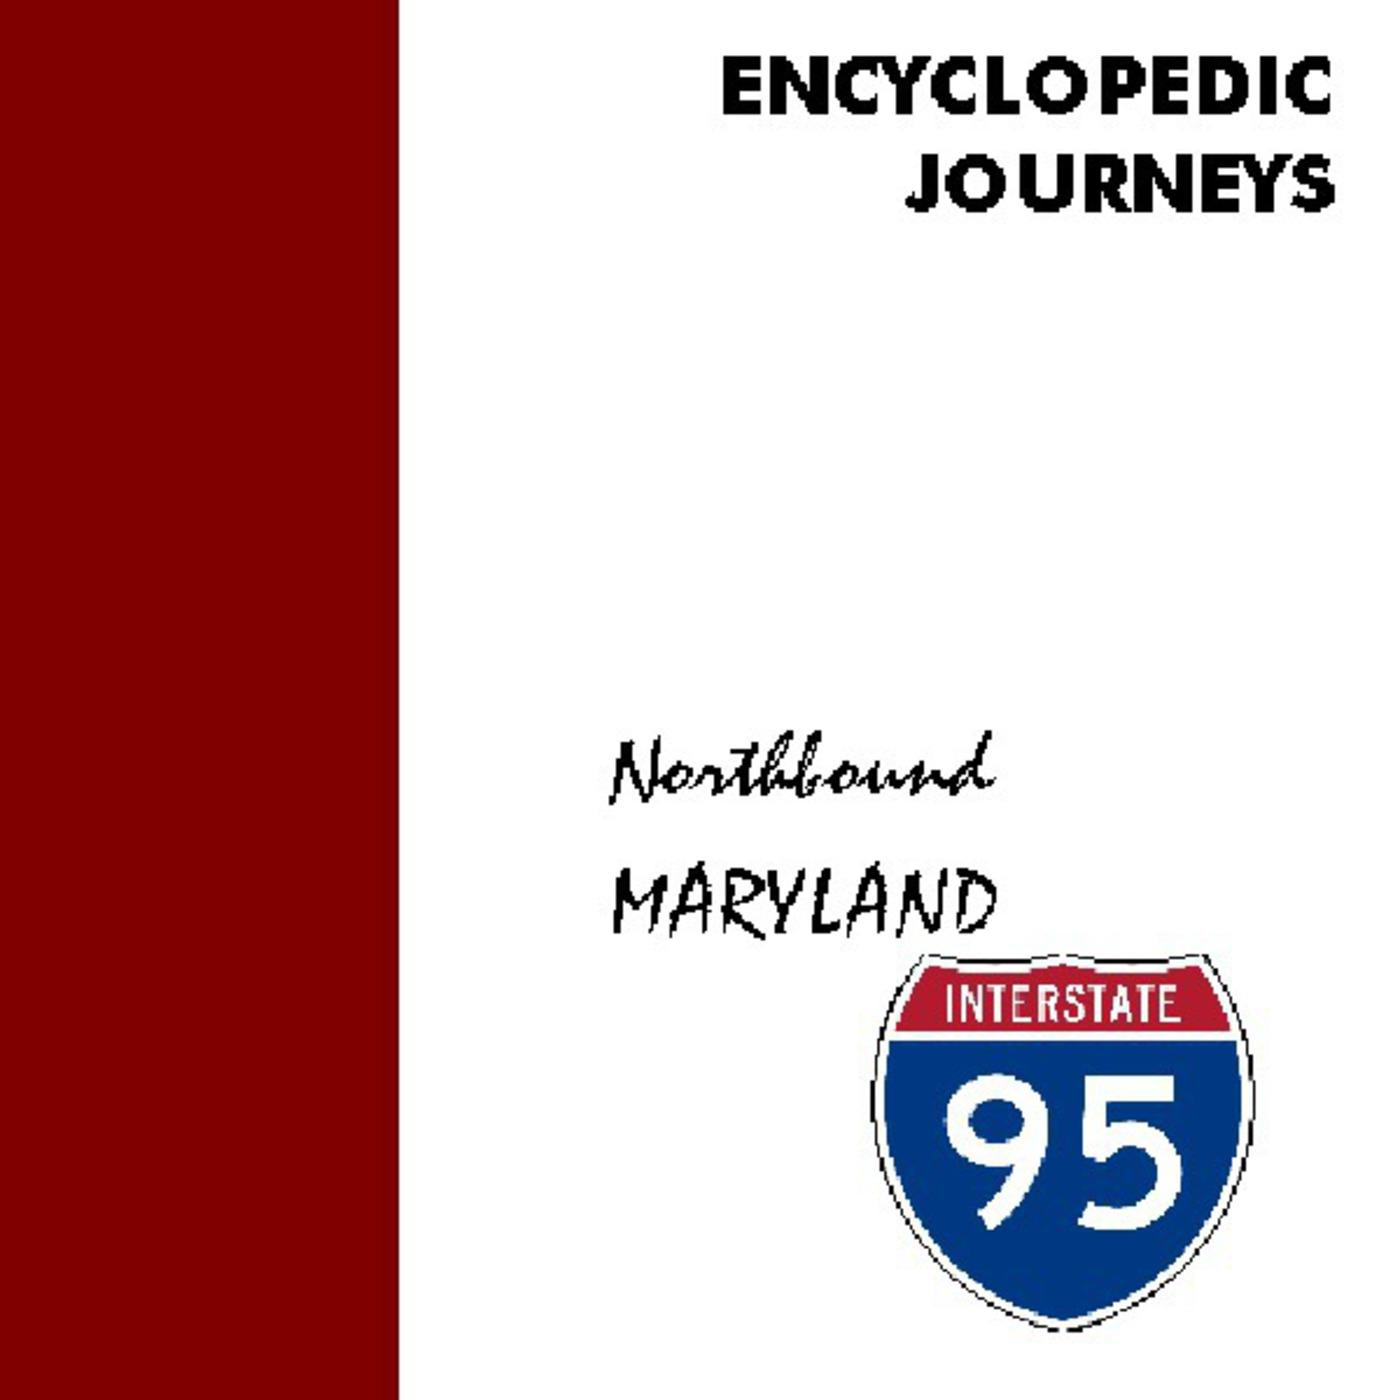 Northbound I-95 Maryland